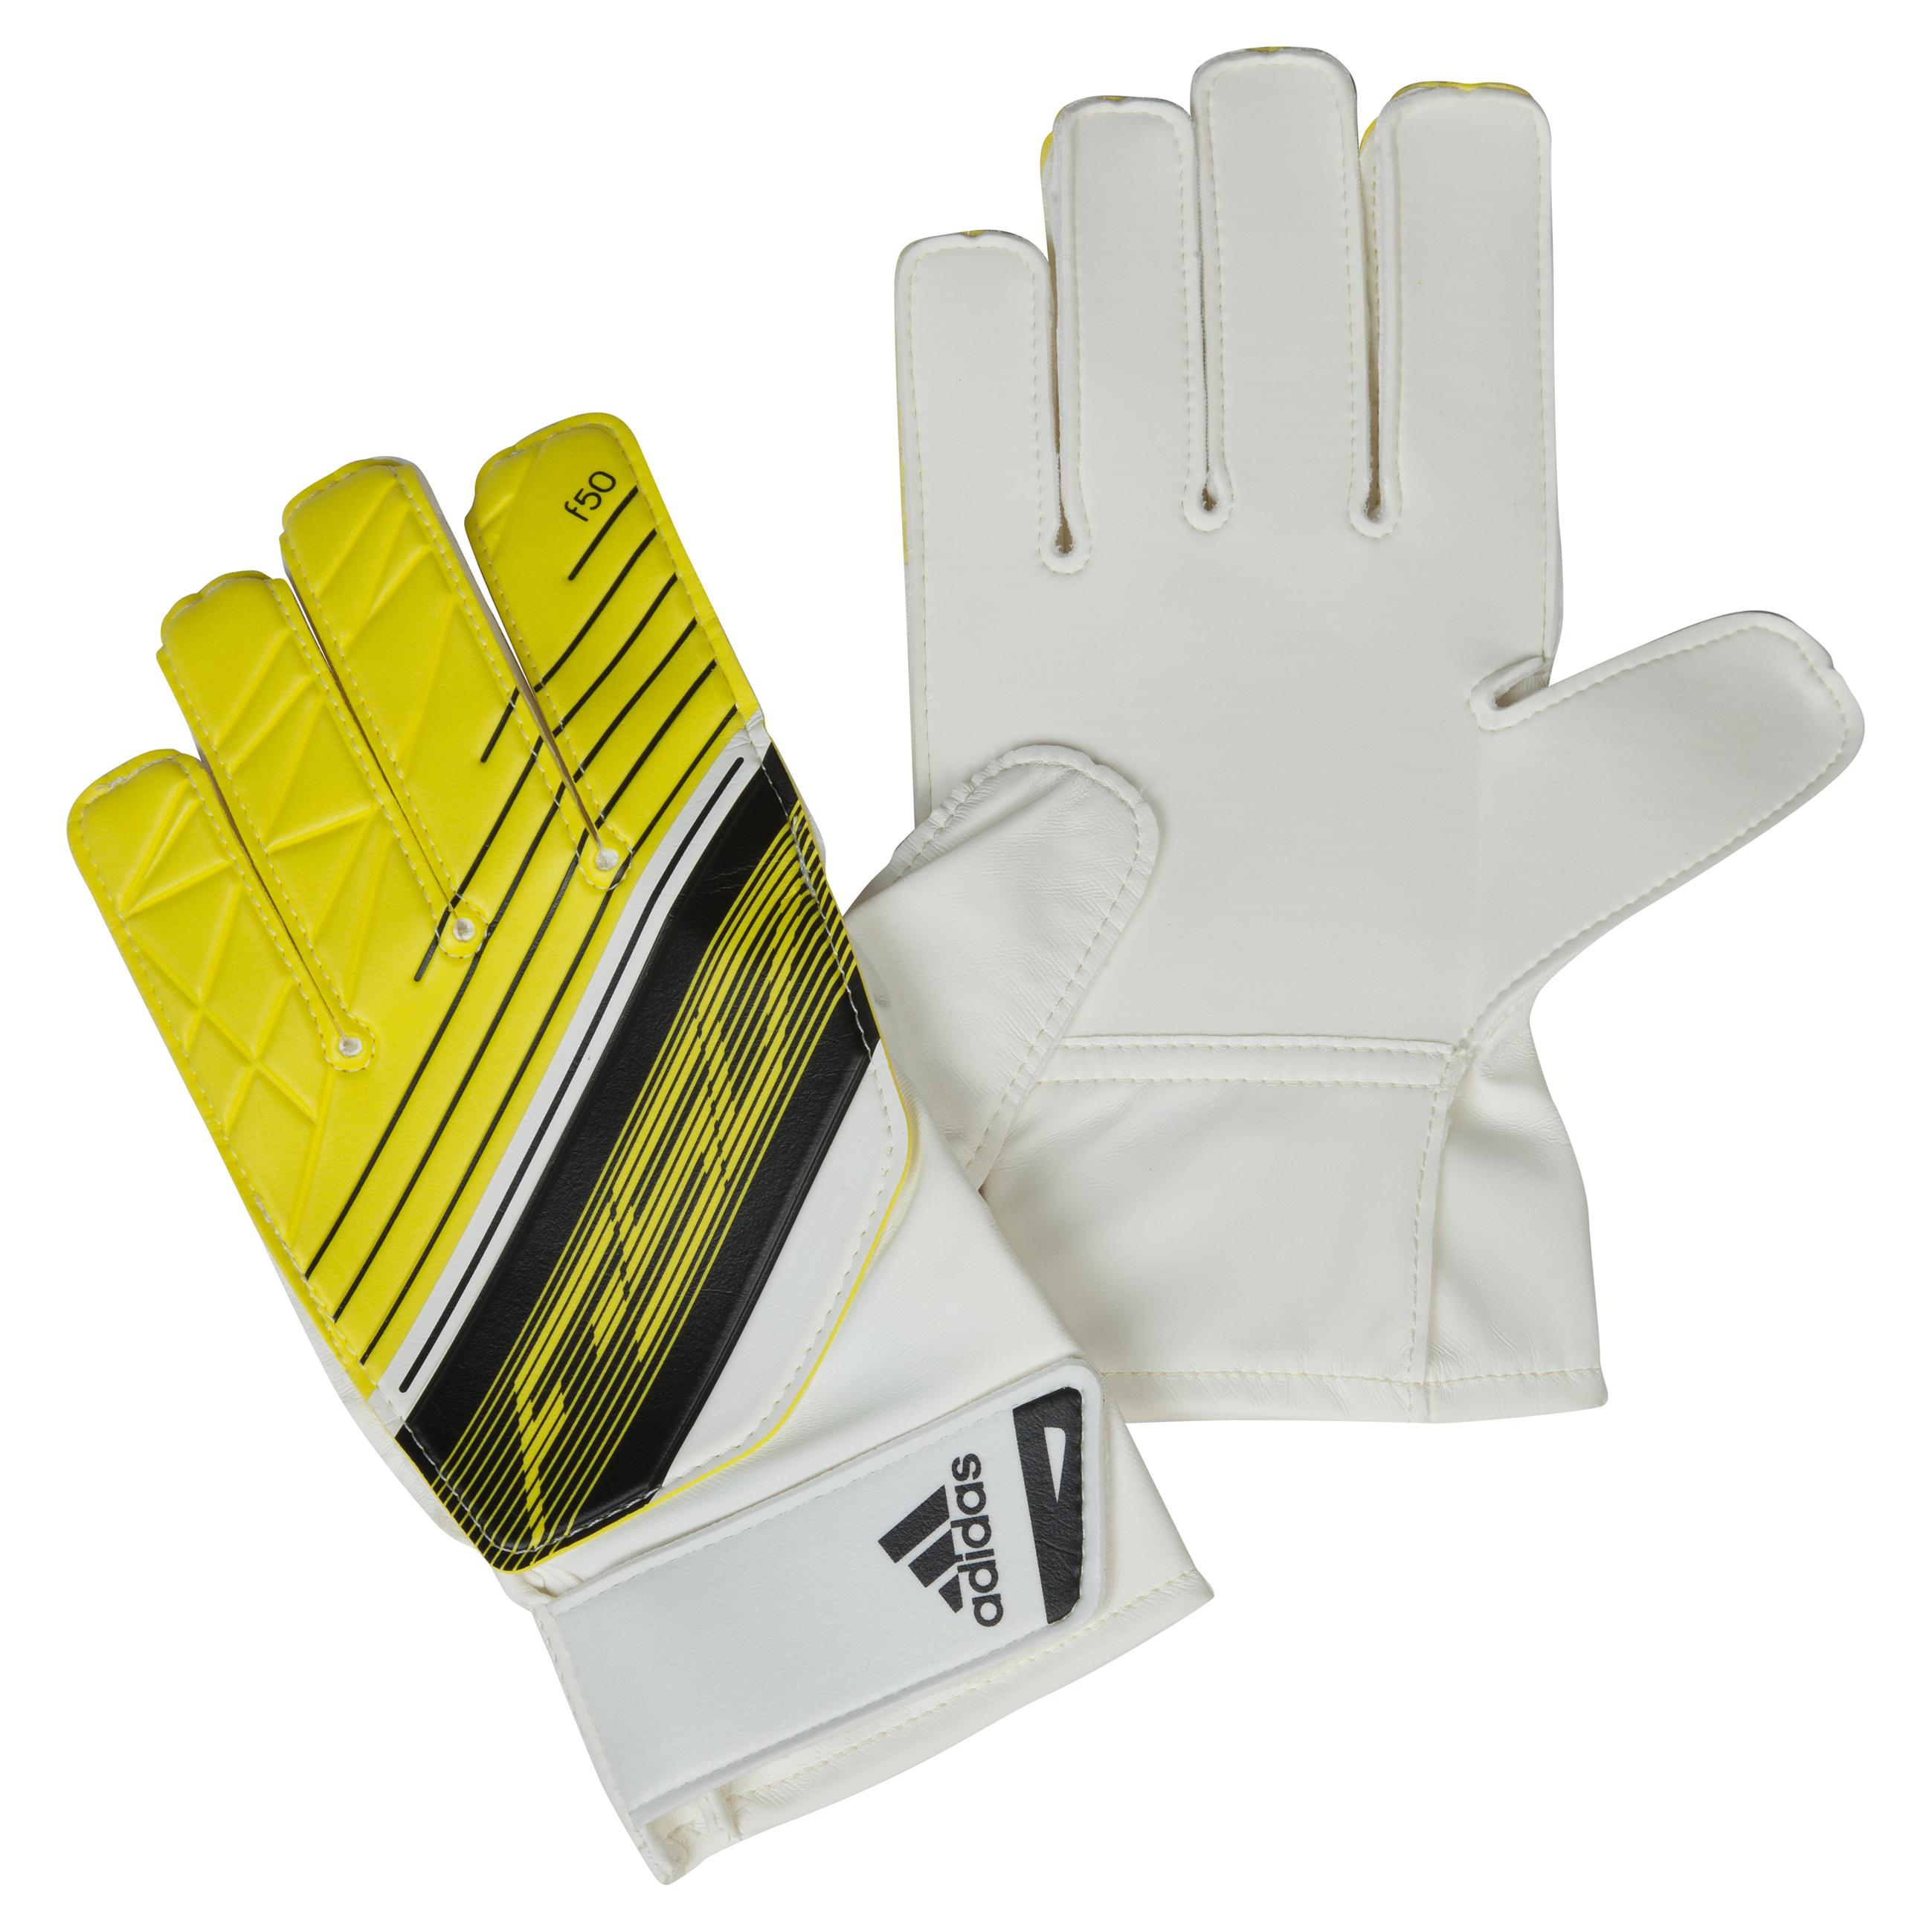 Adidas F50 Training Goalkeeper Gloves - Vivid Yellow S13/White/Black